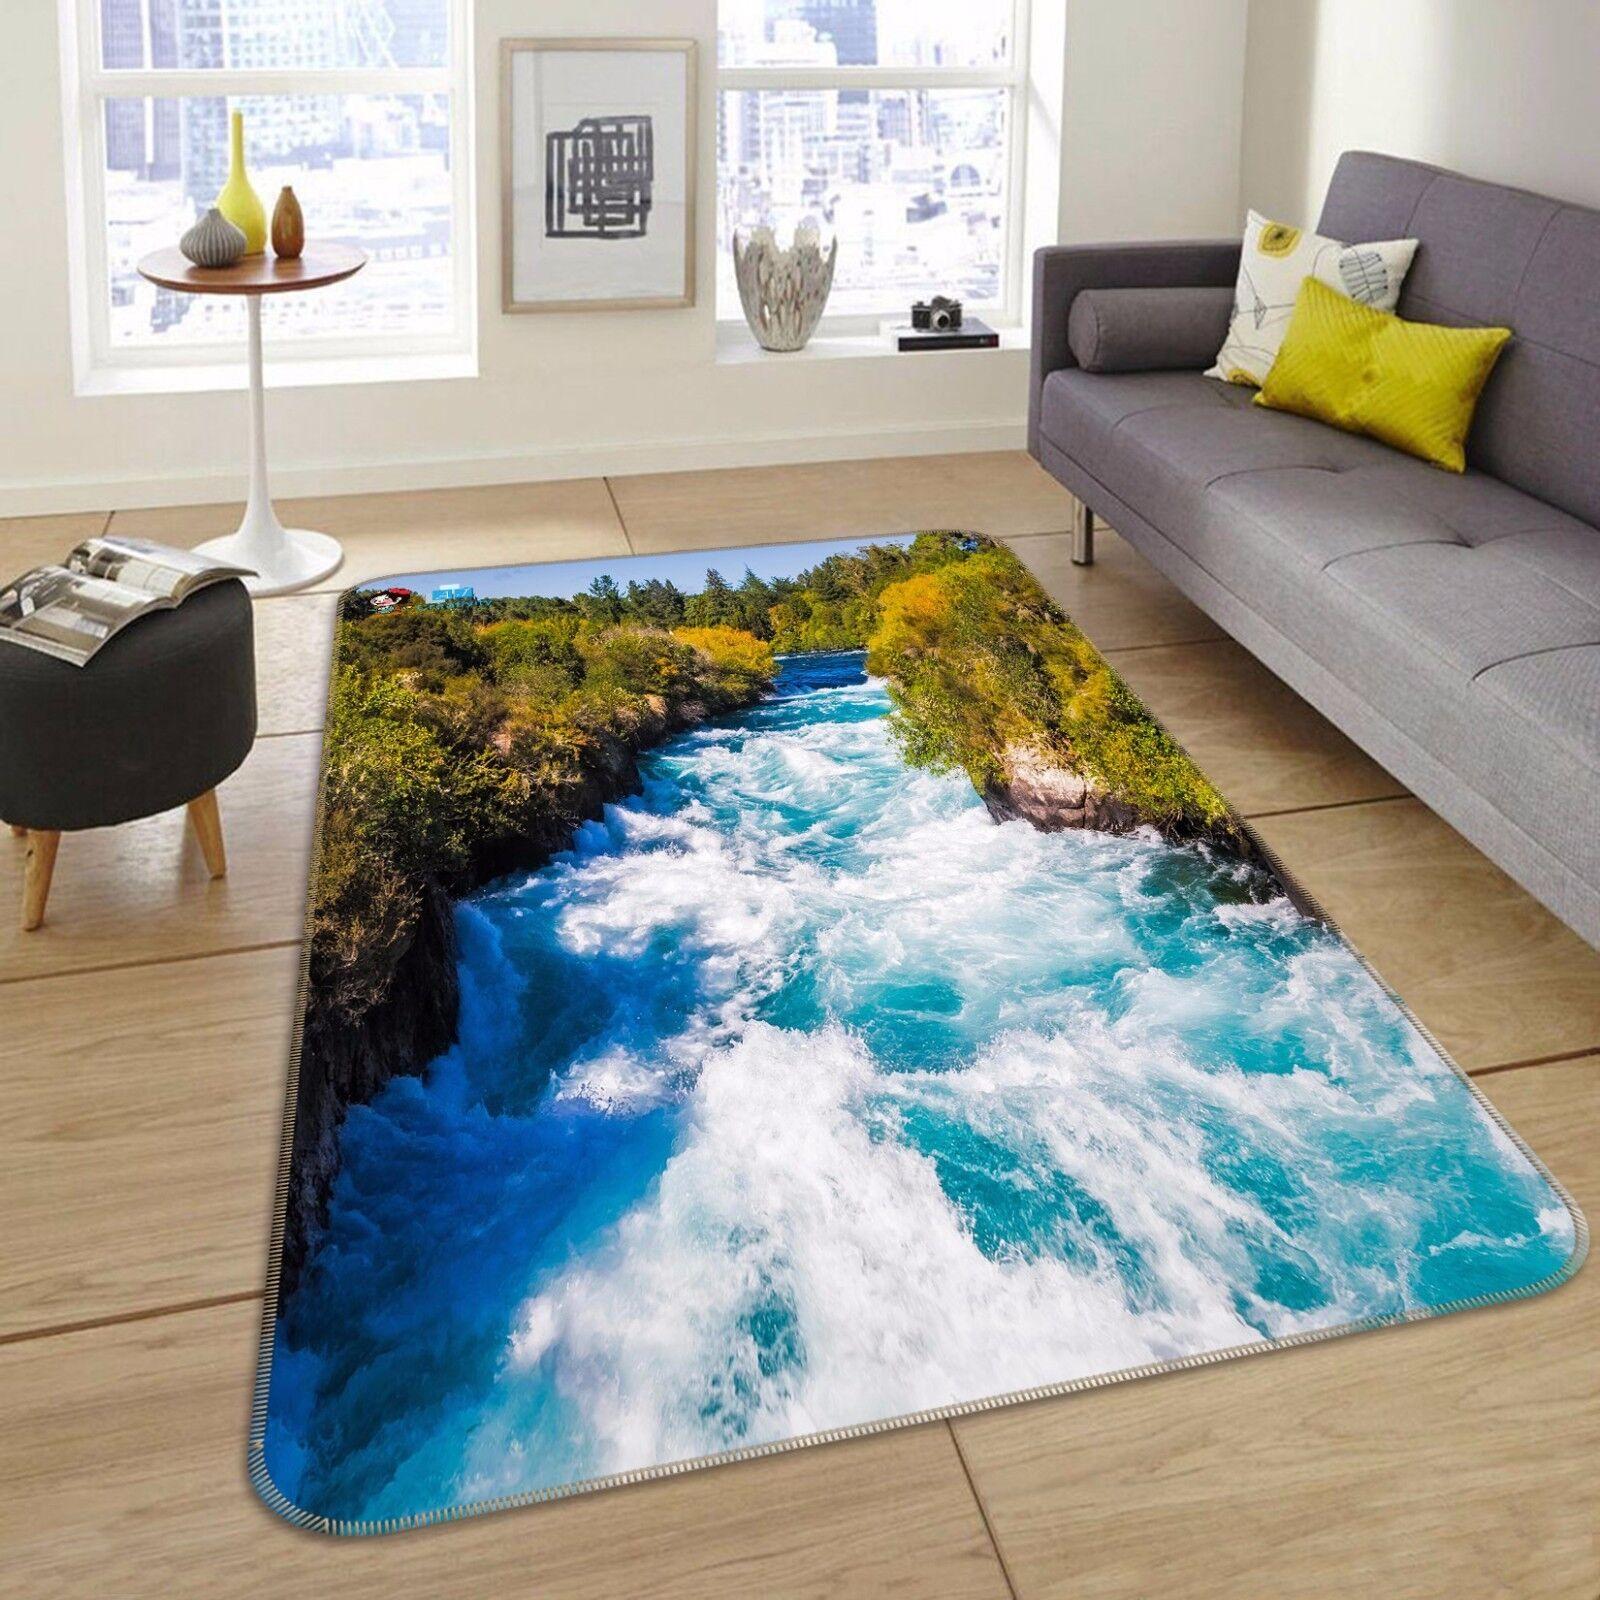 3D Forest River 434 tappetino antiscivolo tappeto camera Tappetino Qualità Elegante foto Tappeto UK